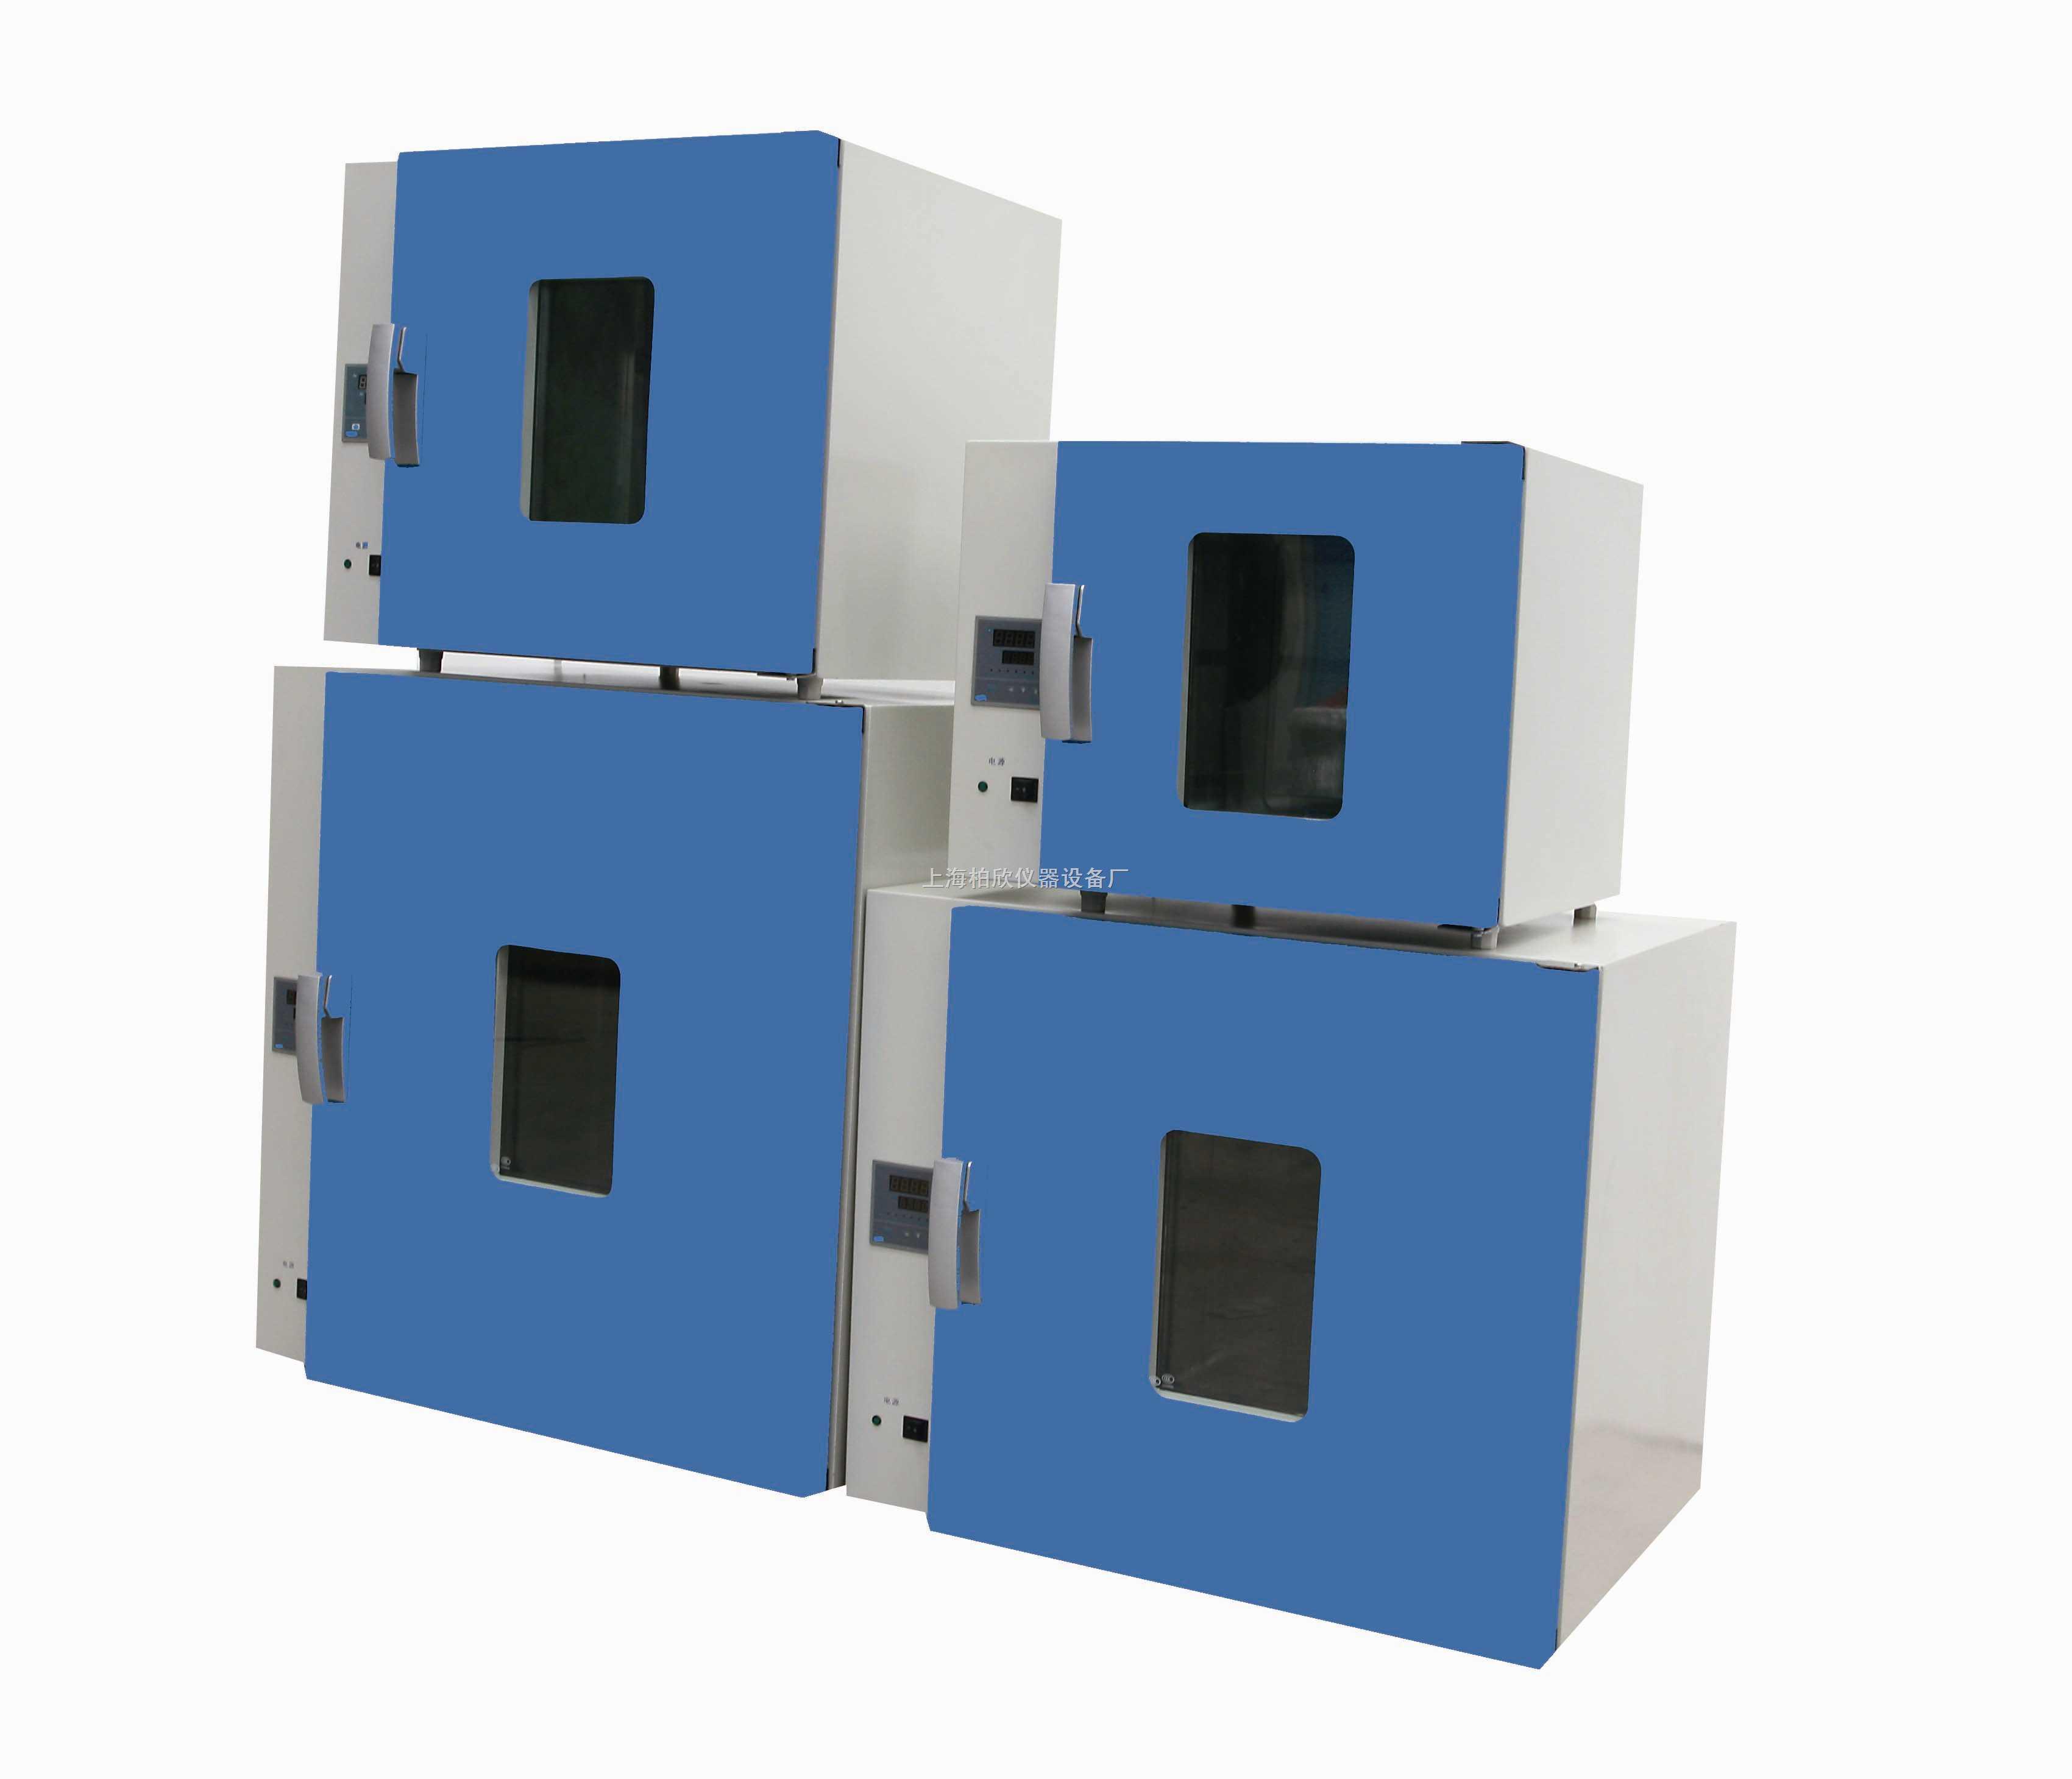 DHG-9203A臺式250度電熱恒溫鼓風干燥箱老化箱 恒溫箱 烘箱價格